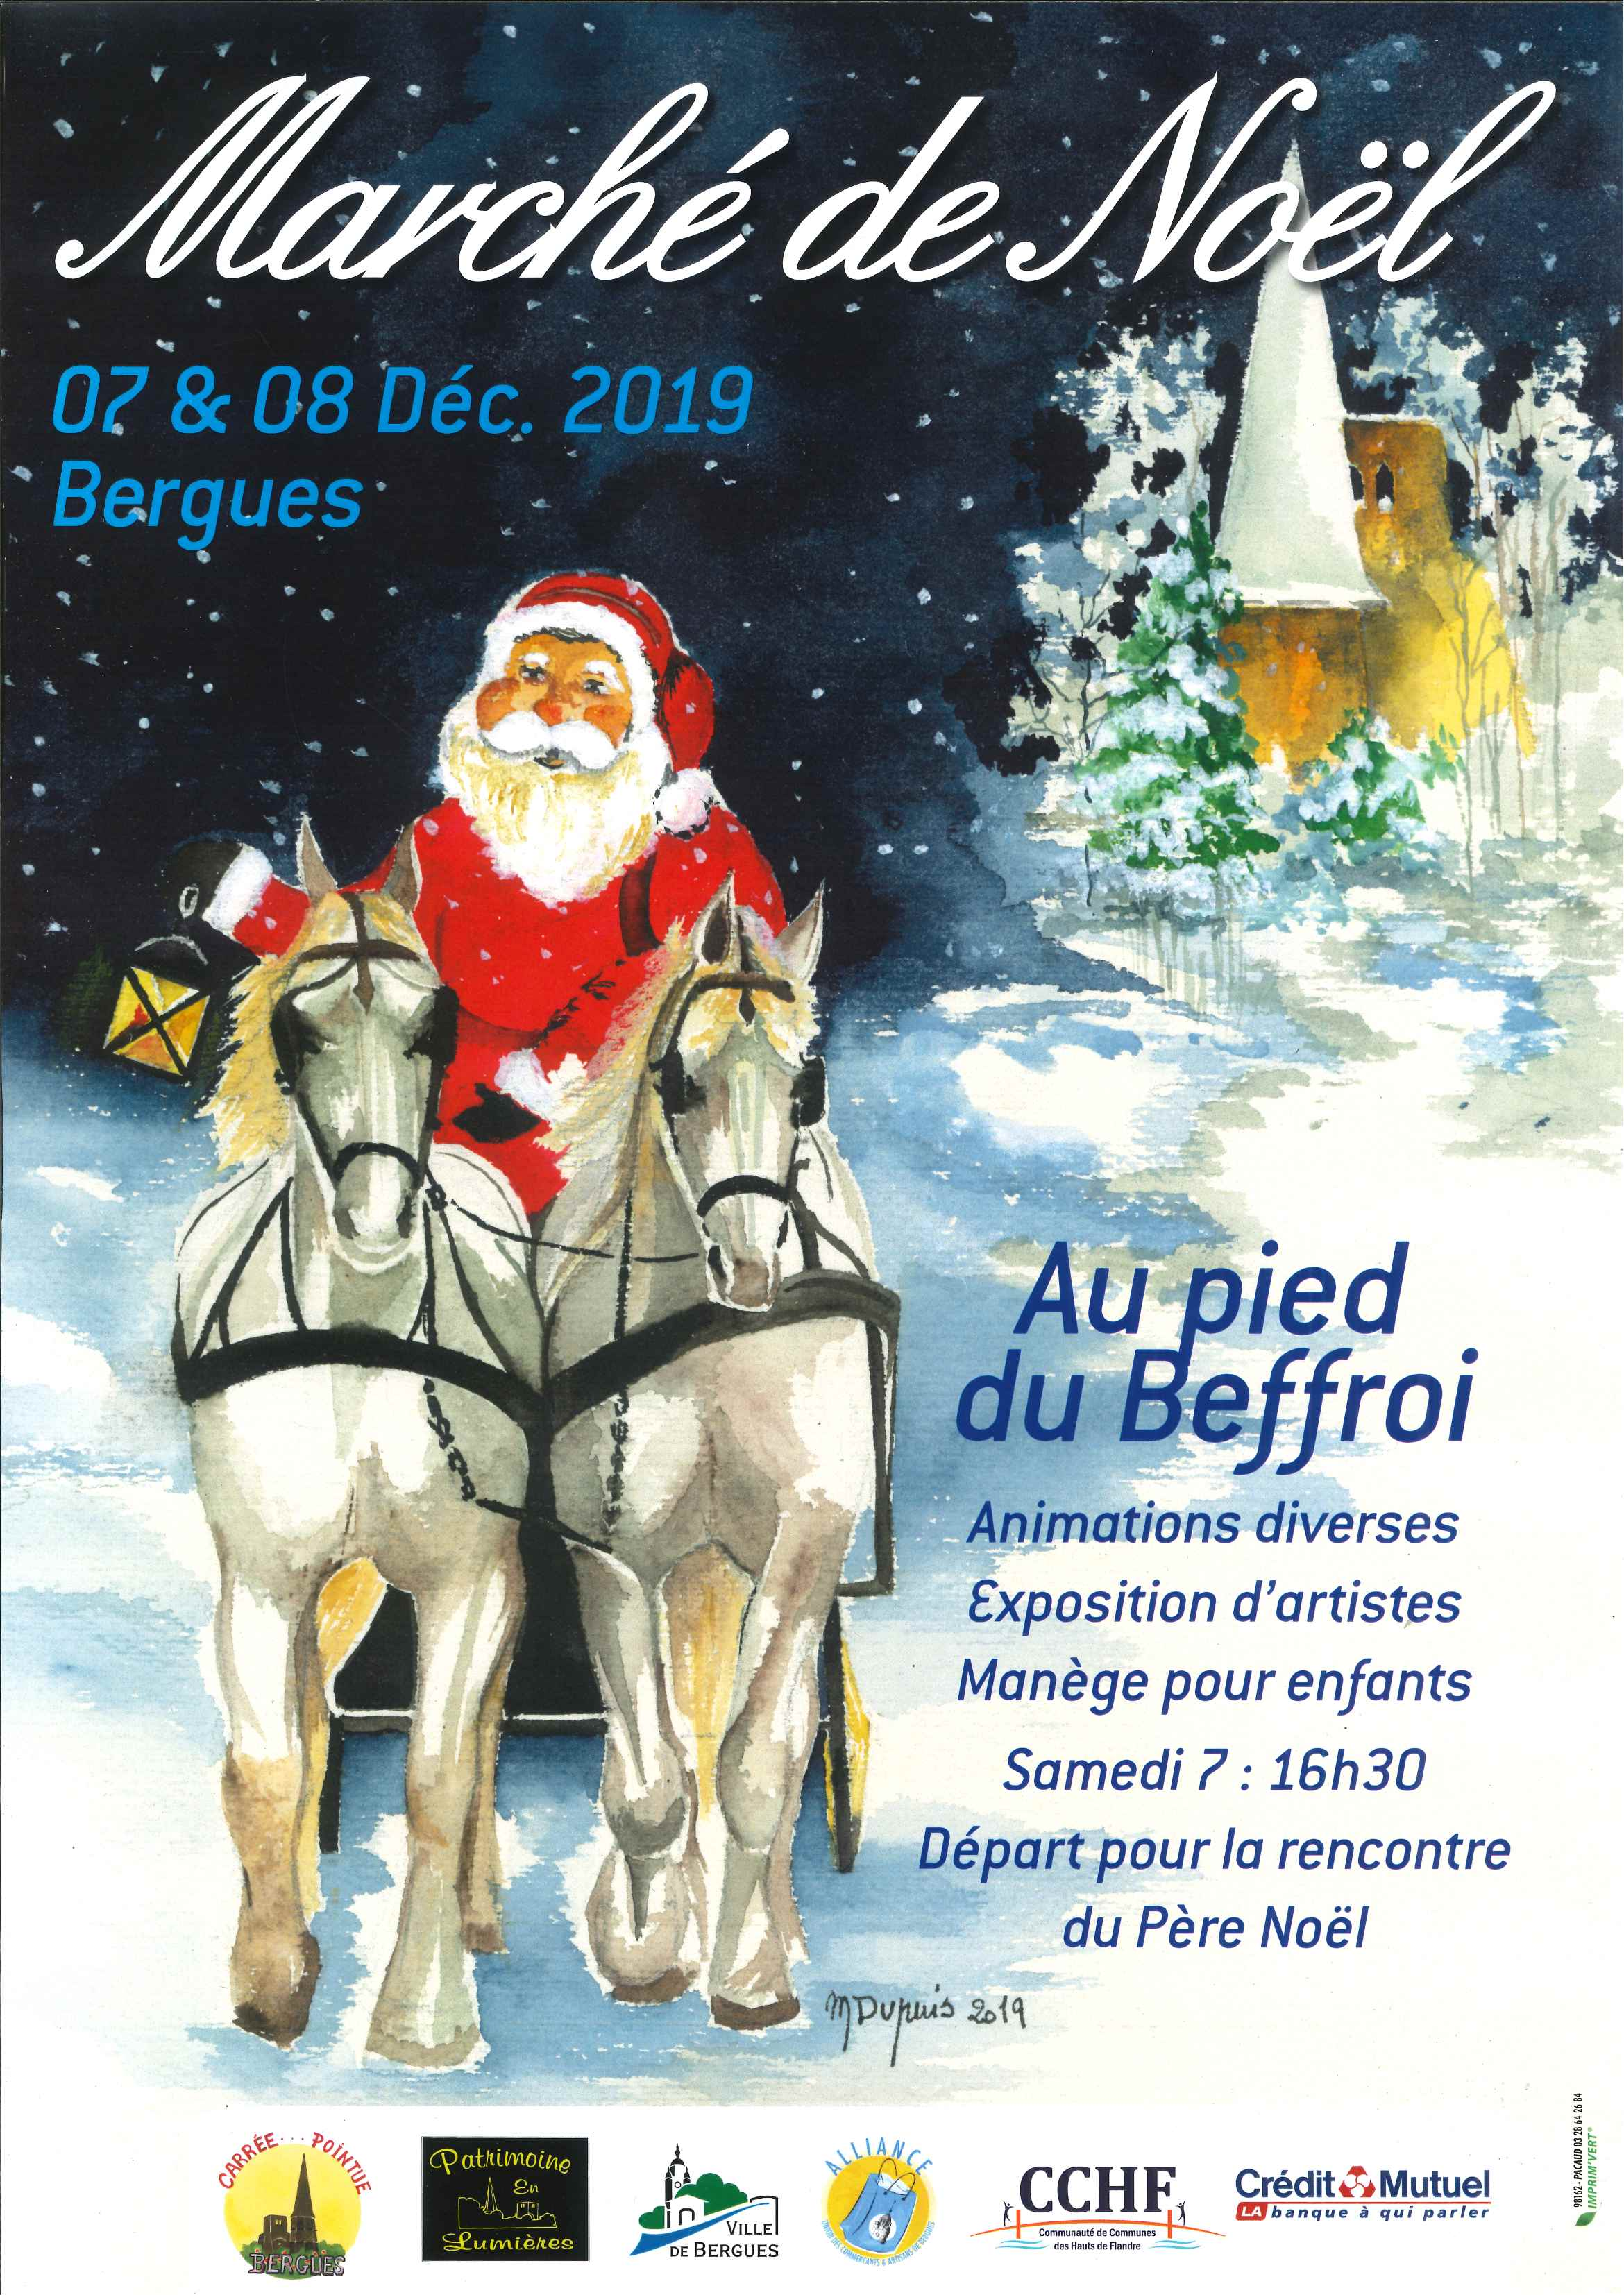 Marche de Noël - Bergues